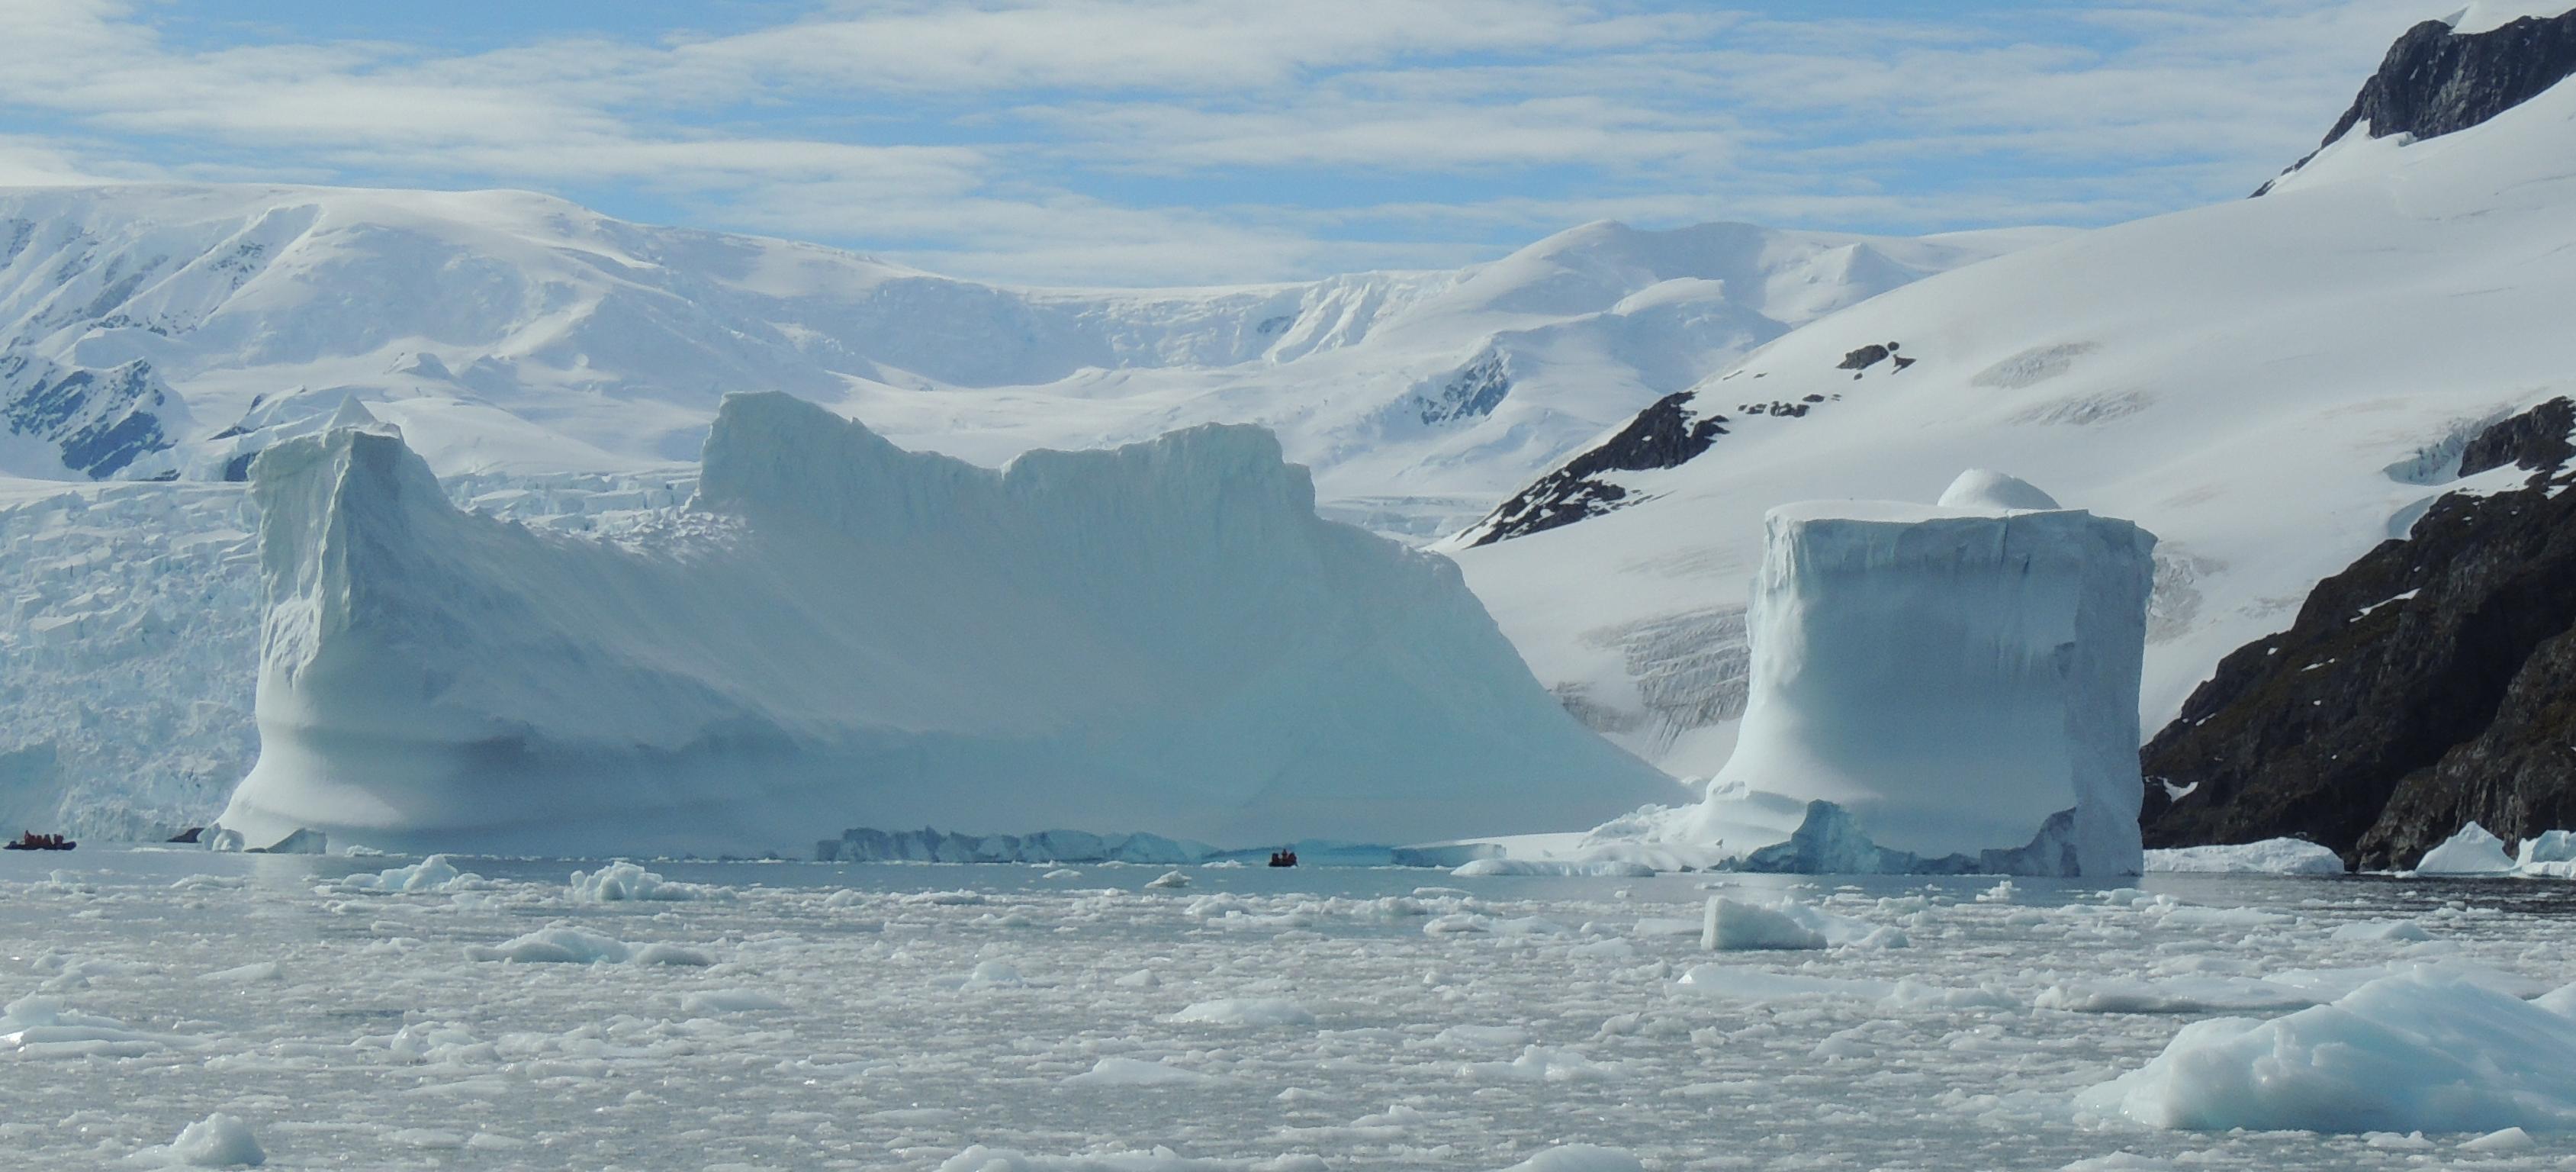 Cierva Cove And Enterprise Islands Antarctica Monday